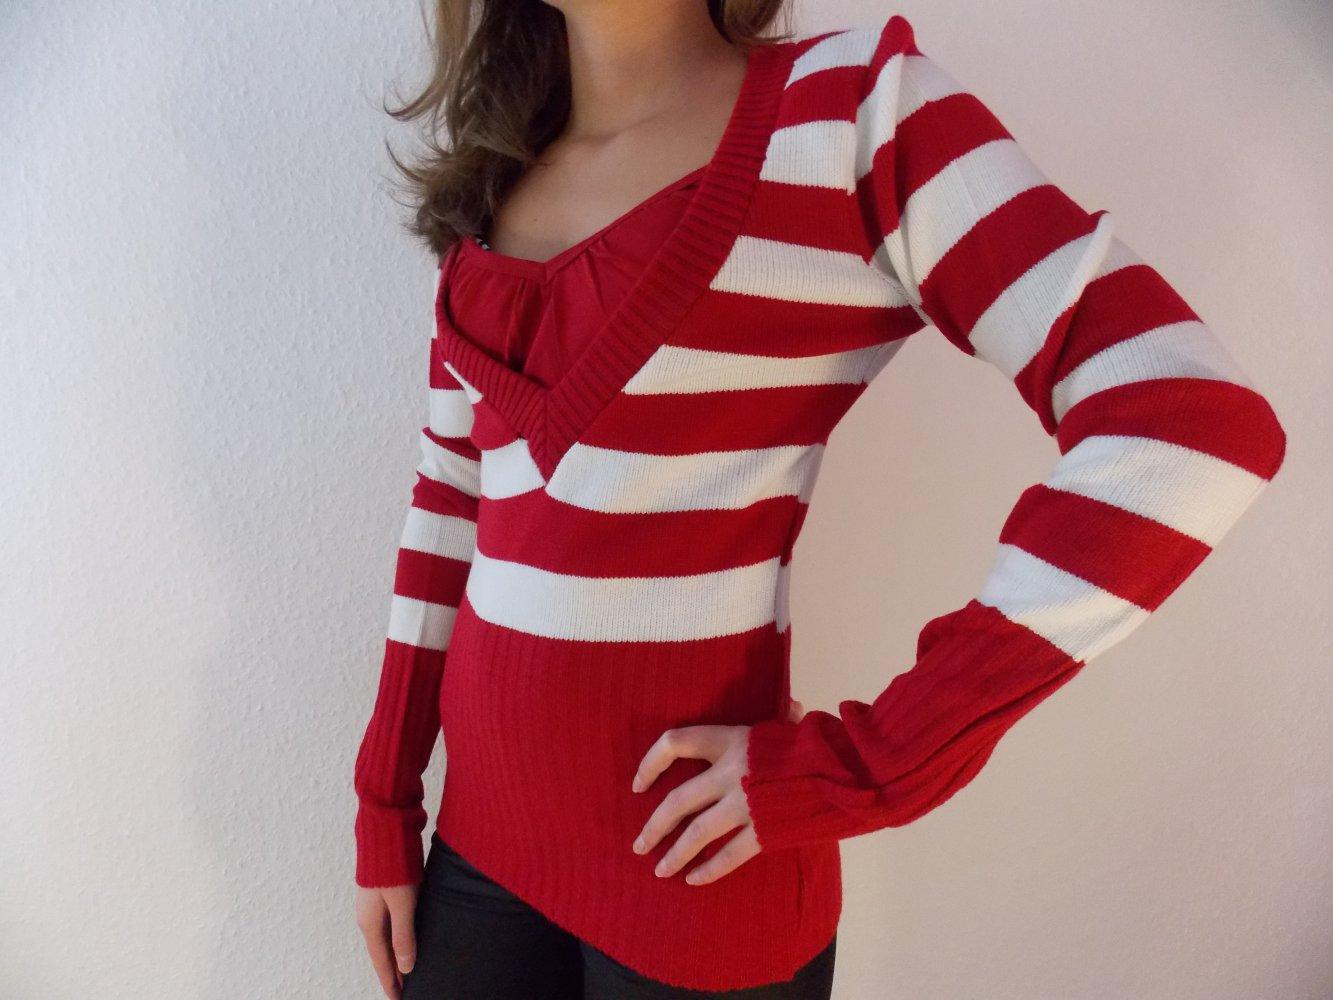 quality design 29375 32d9f Damenpullover Strickpullover Pullover Damen gestreift rot-weiß Gr. M/L